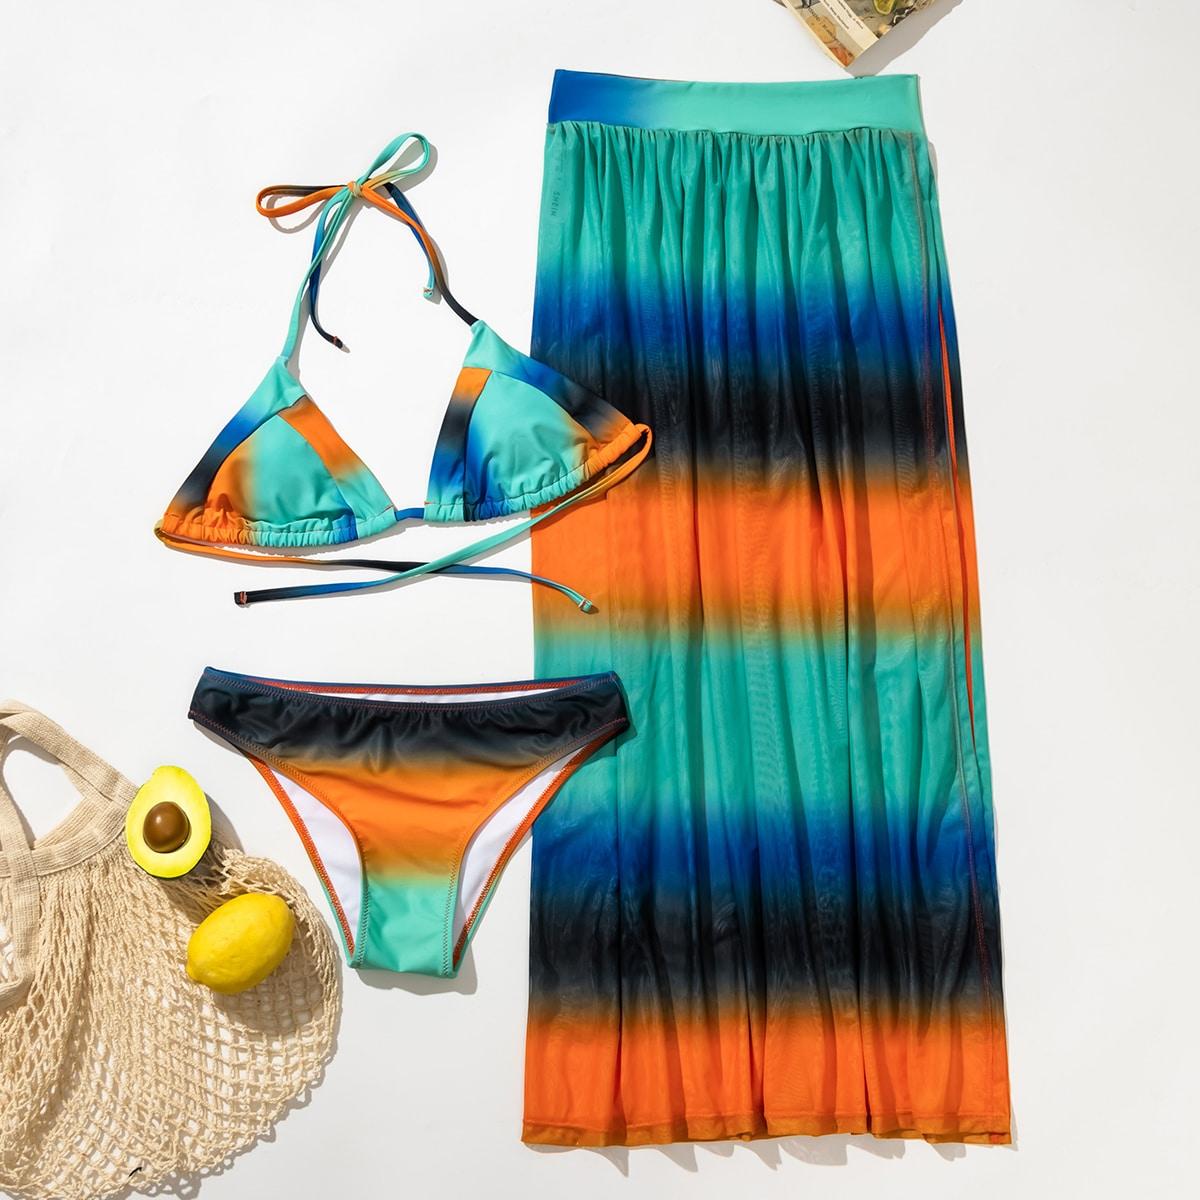 SHEIN / 3pack Colorblock Halter Bikini Swimsuit & Beach Skirt